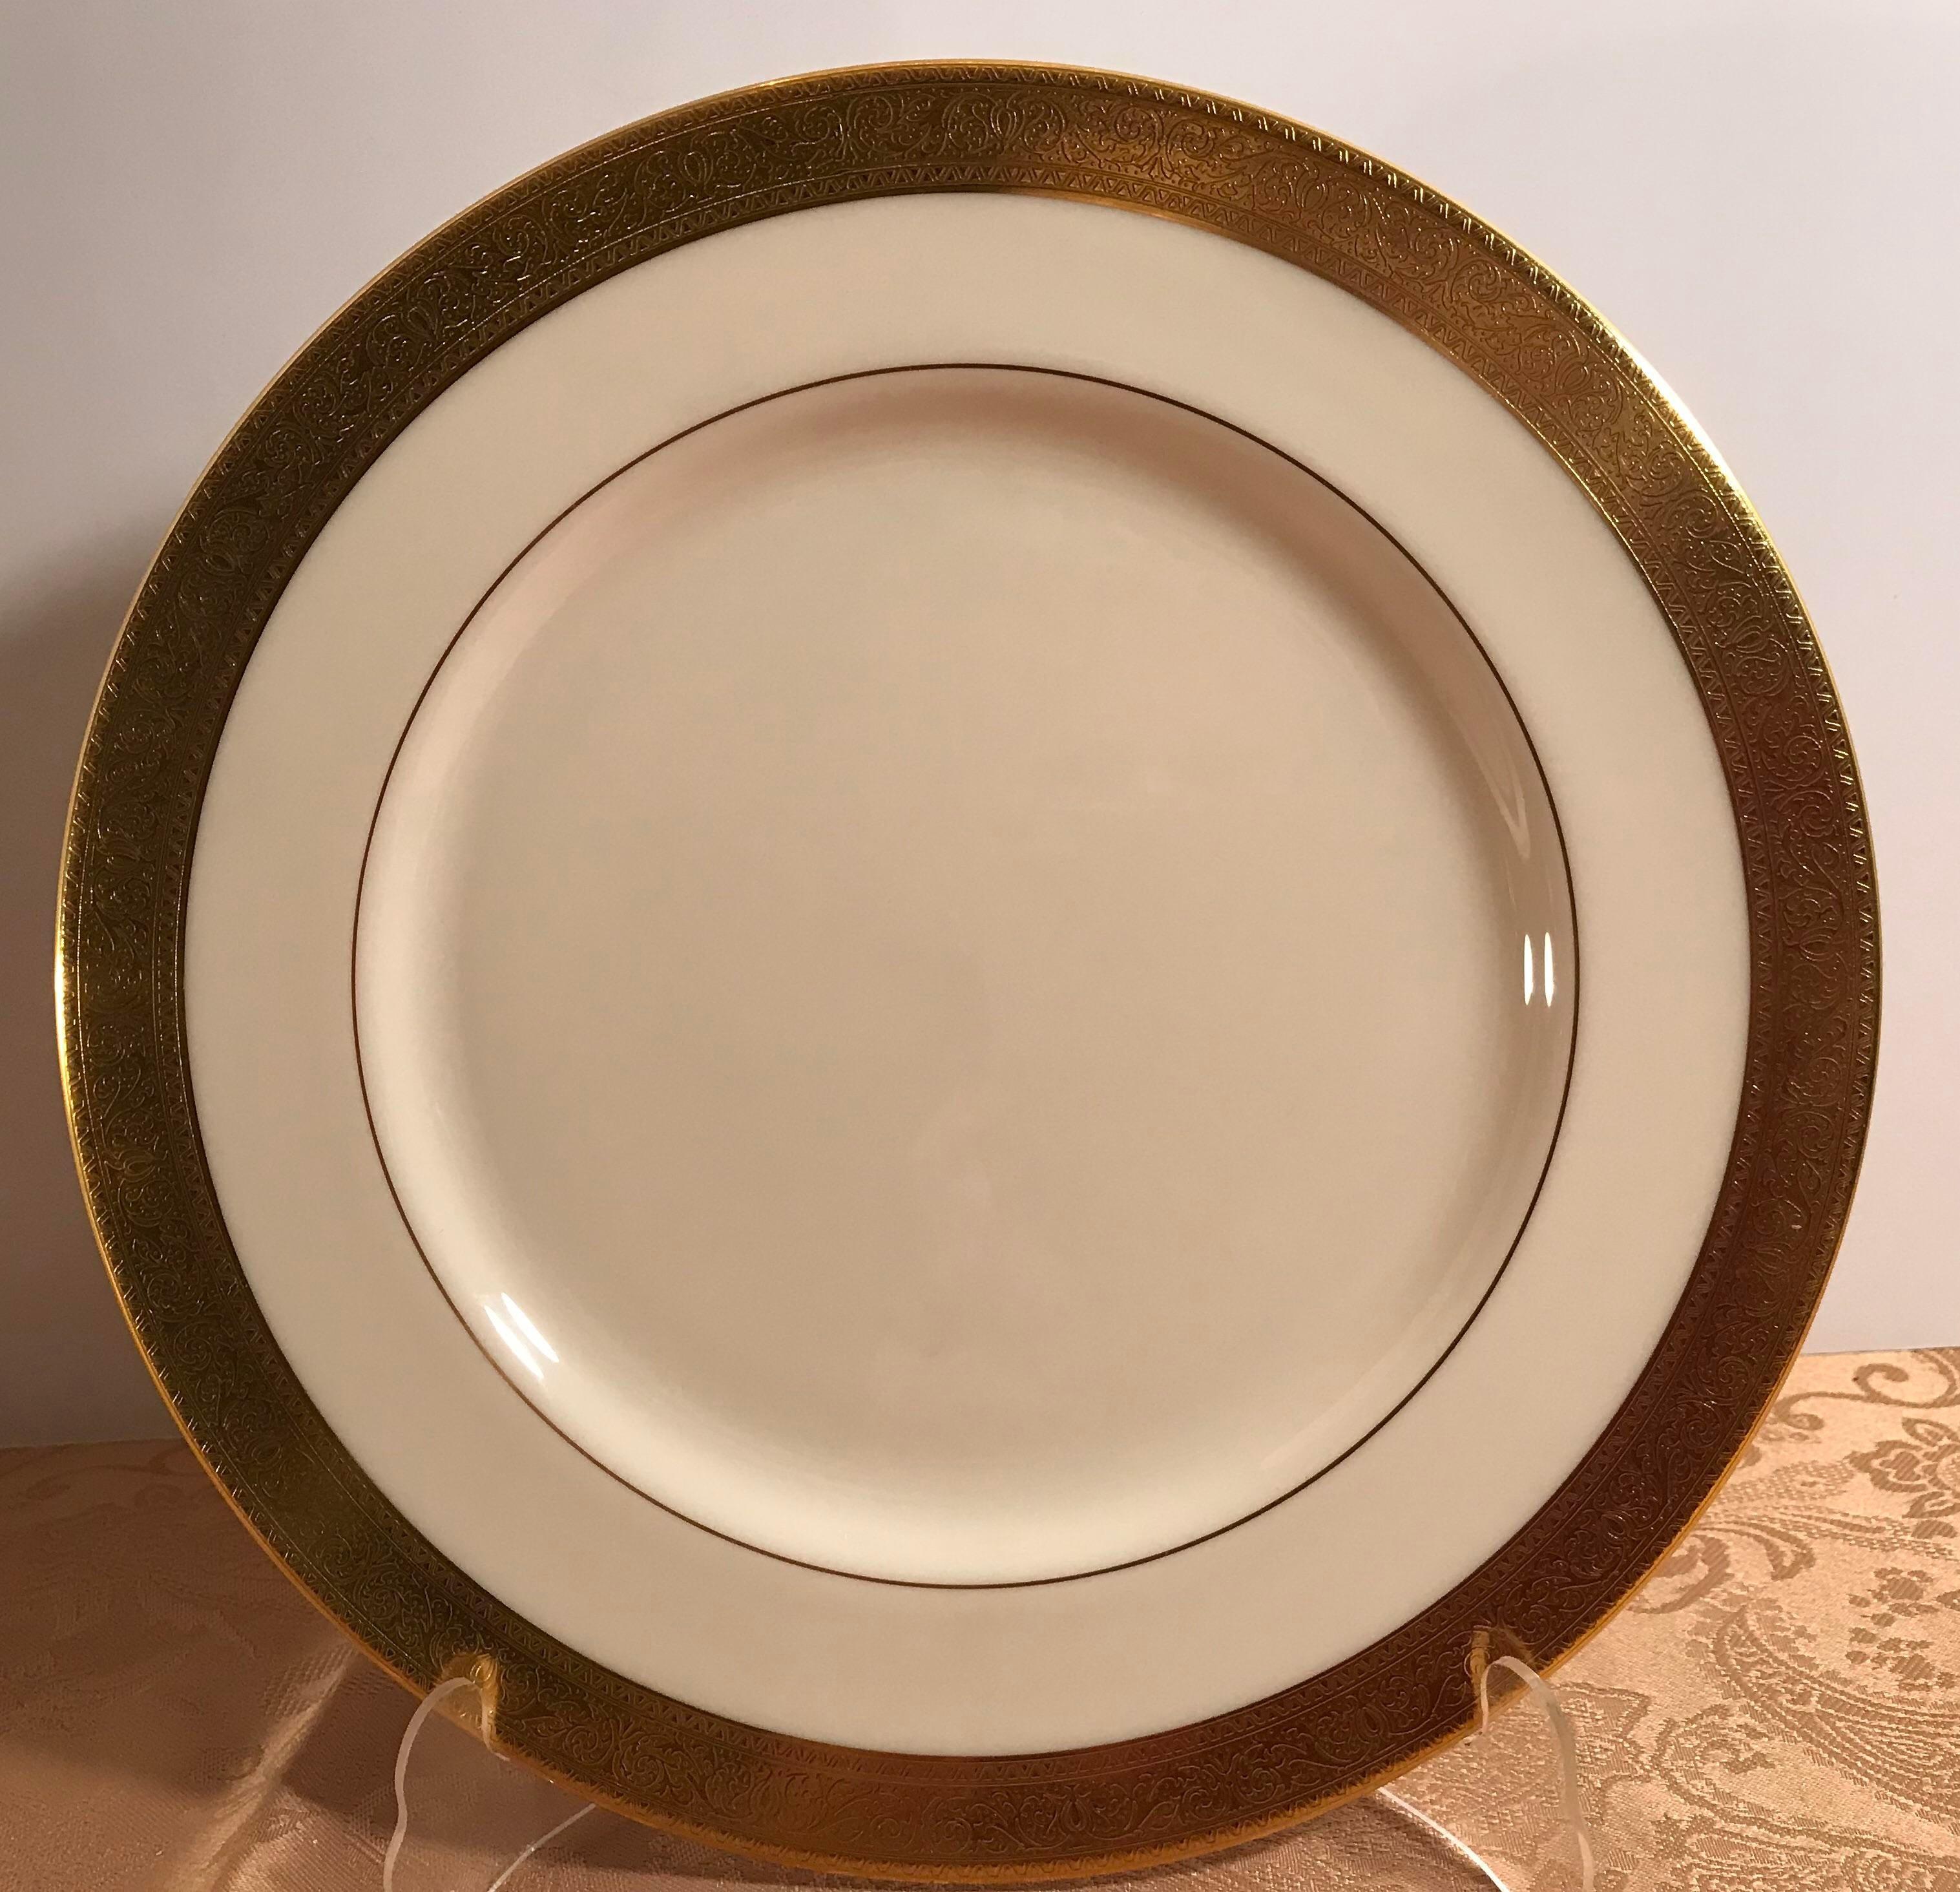 Vintage Lenox Gold Rim Fine China Dinnerware - Set of 41 - Image 6 of 11 & Vintage Lenox Gold Rim Fine China Dinnerware - Set of 41   Chairish